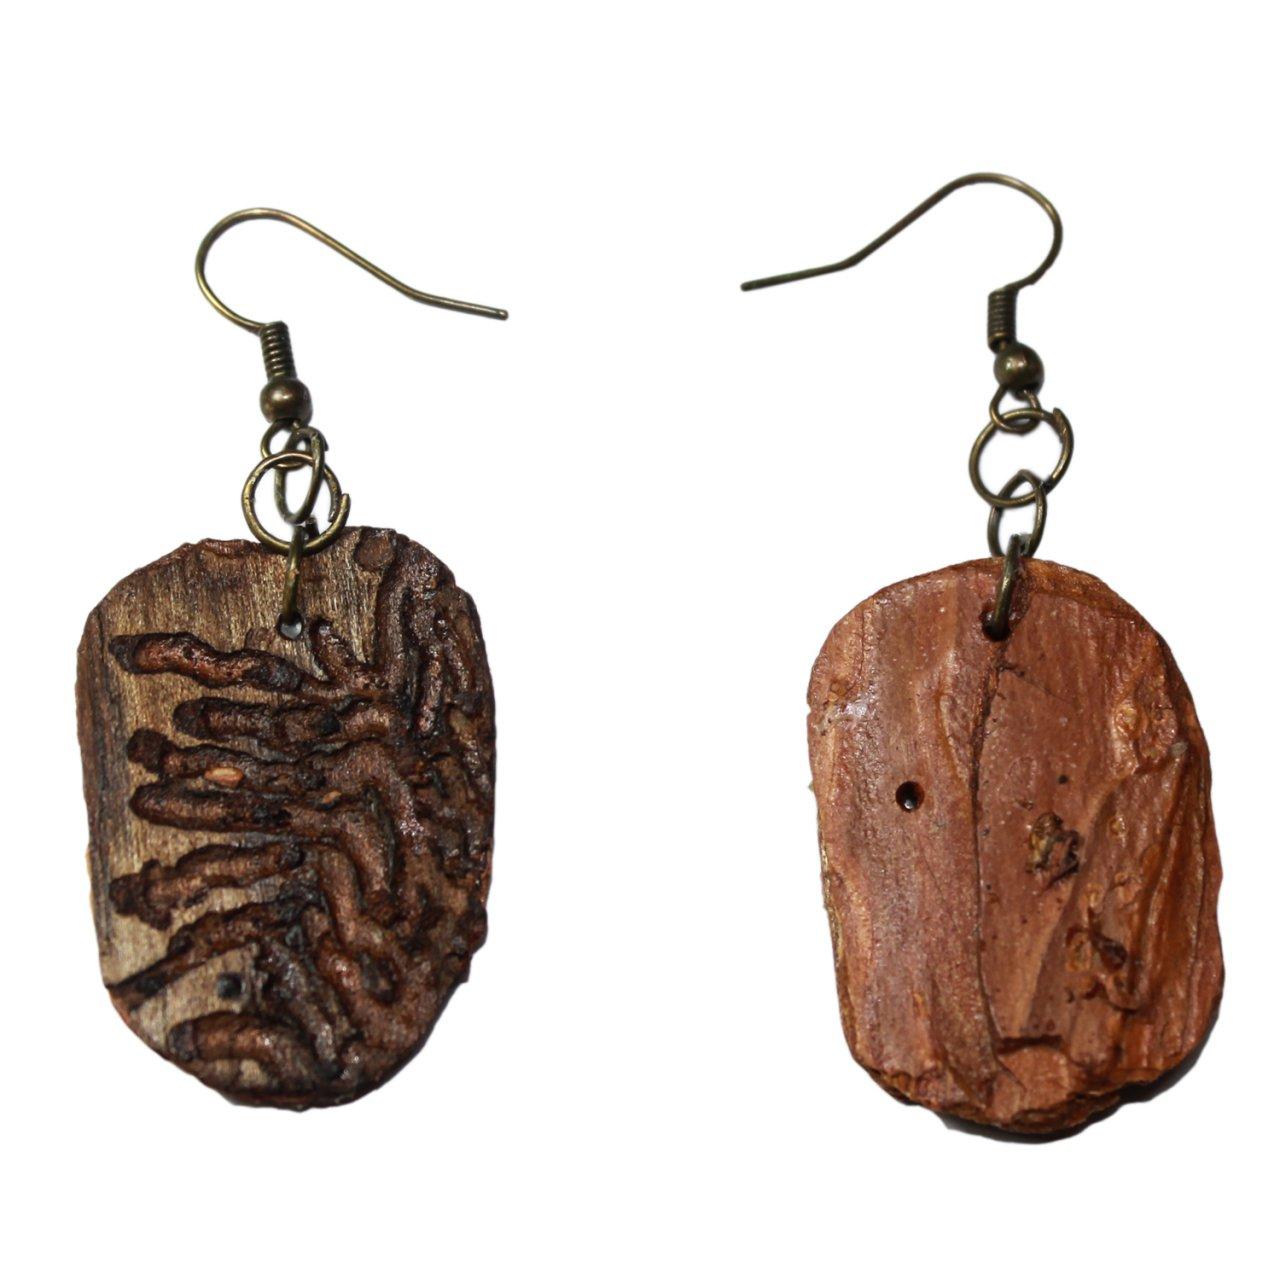 گوشواره زنانه طرح چوب درخت کد 11